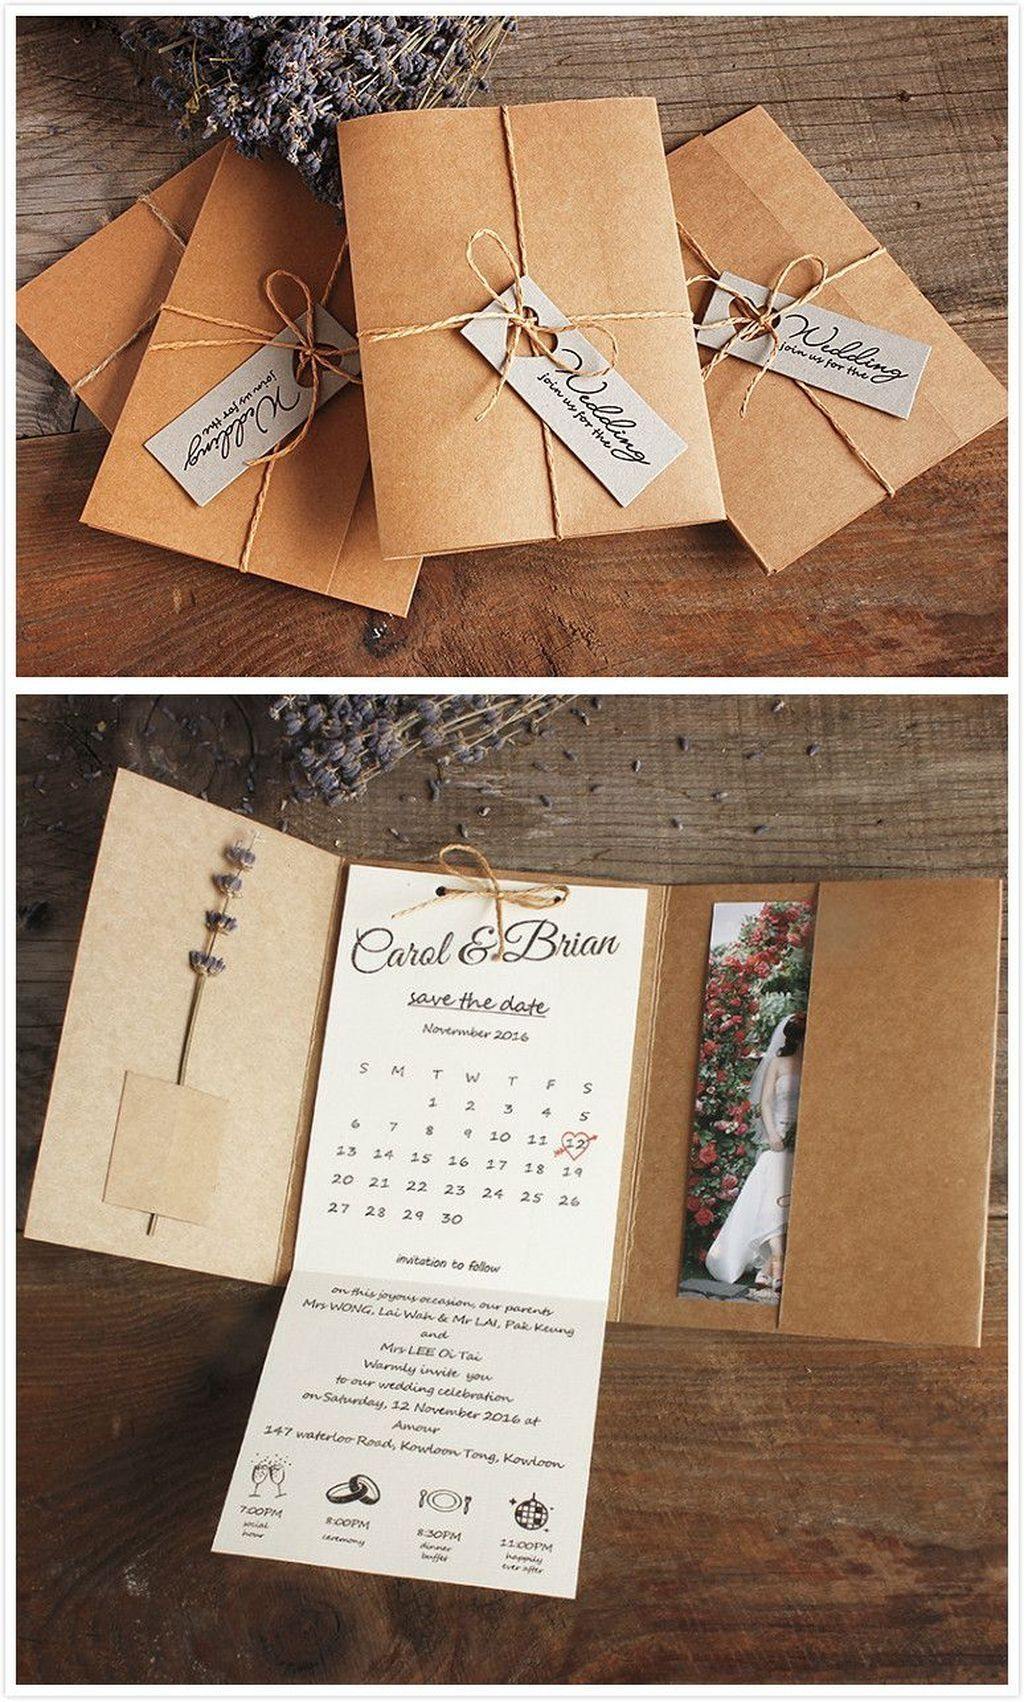 30 Awesome Wedding Invitations Ideas Pocket Wedding Invitations Wedding Invitations Rustic Wedding Invitation Design